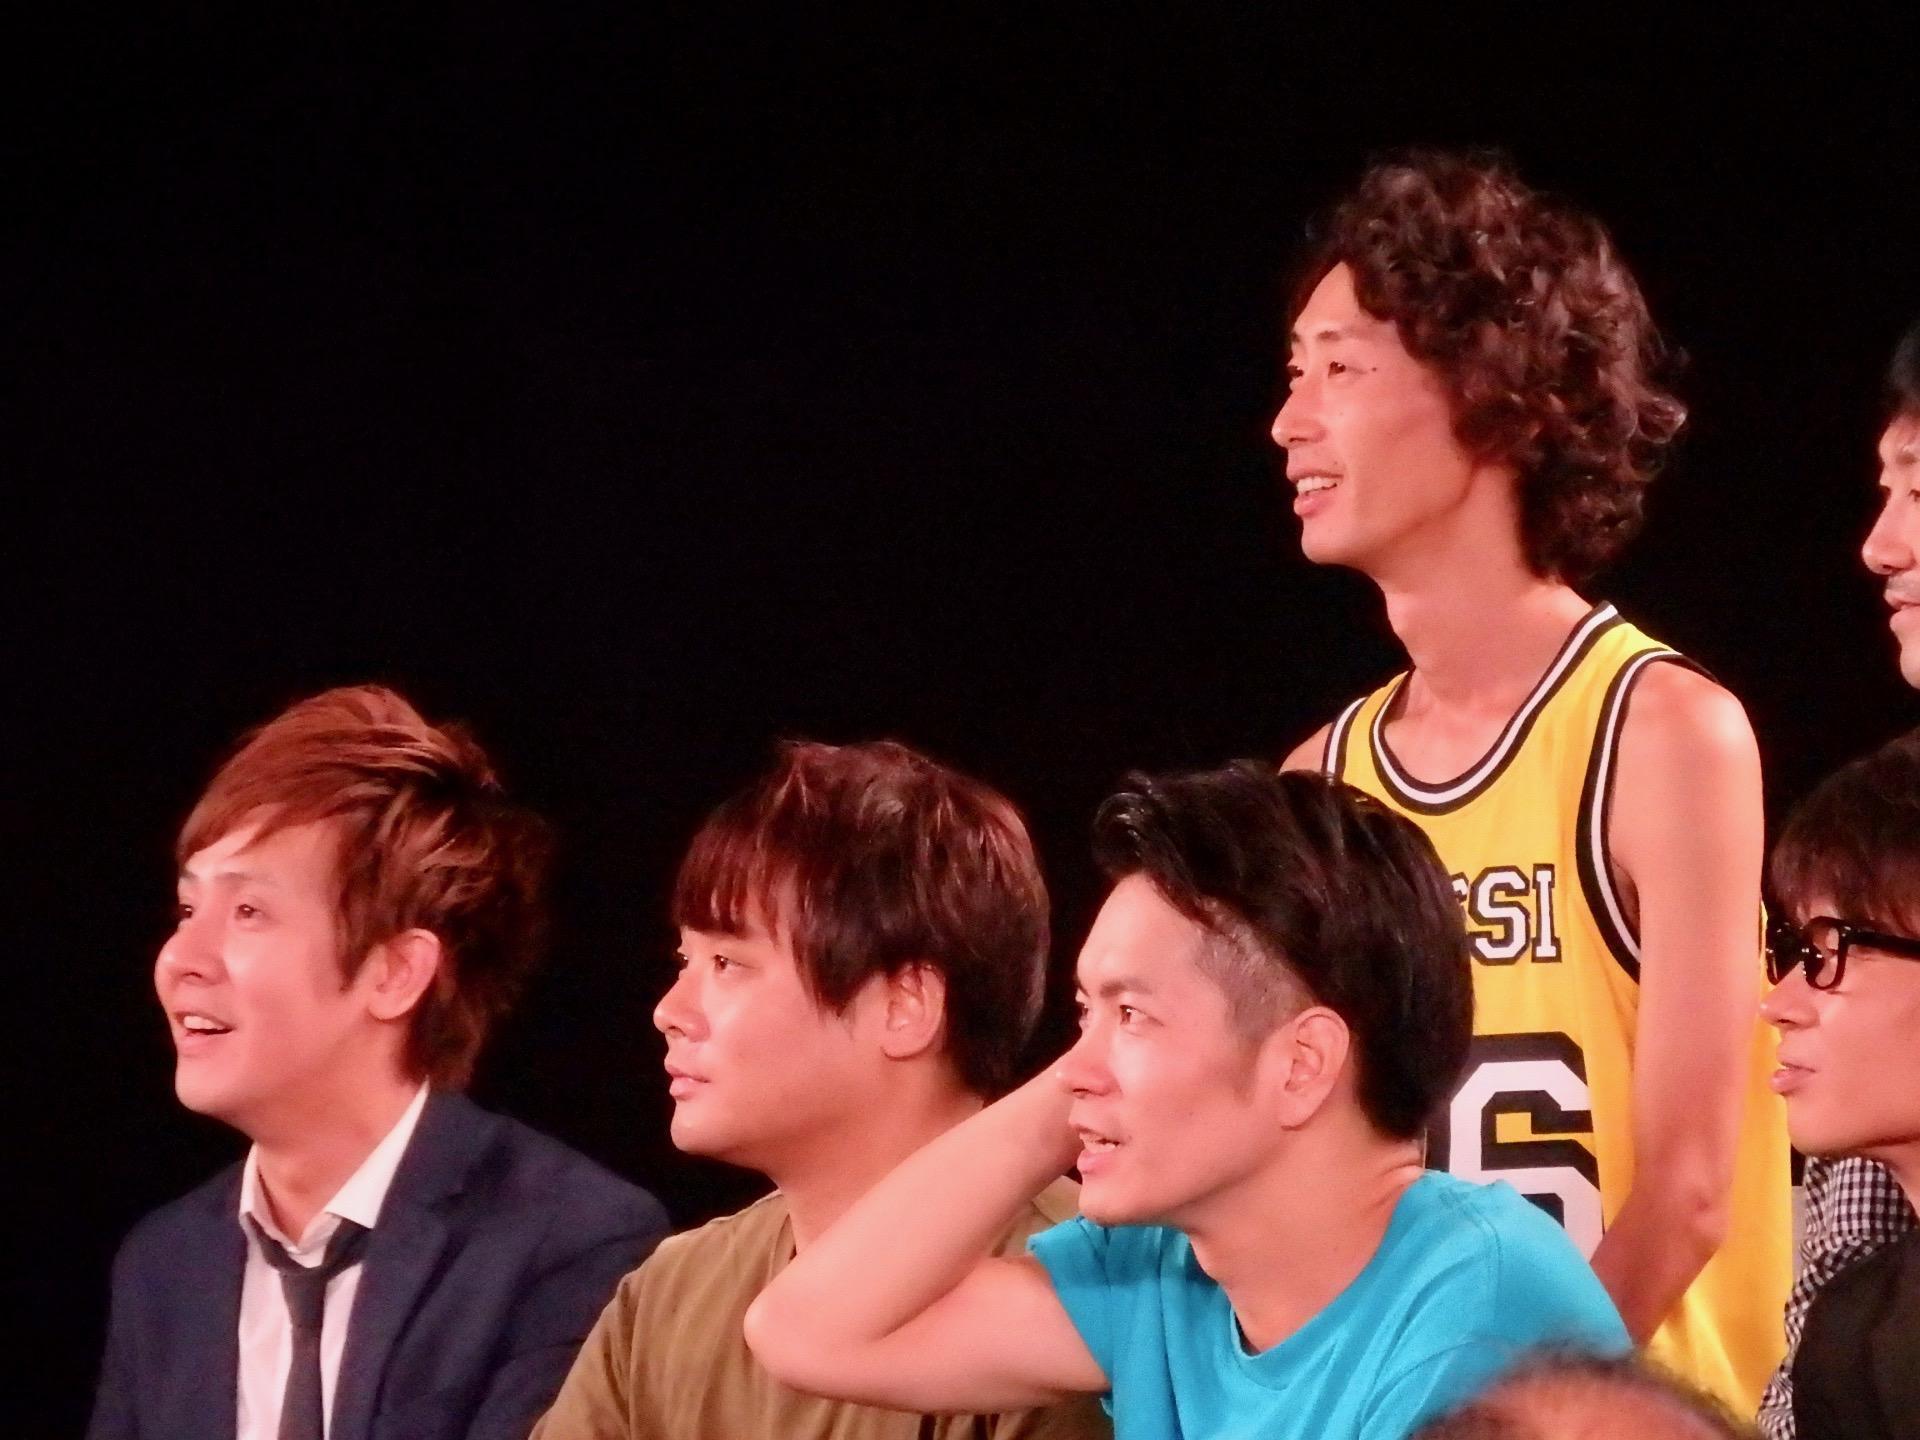 http://news.yoshimoto.co.jp/20171016142821-07eca61357b4e602fdfc2ca2e889dbeaebc1986e.jpg